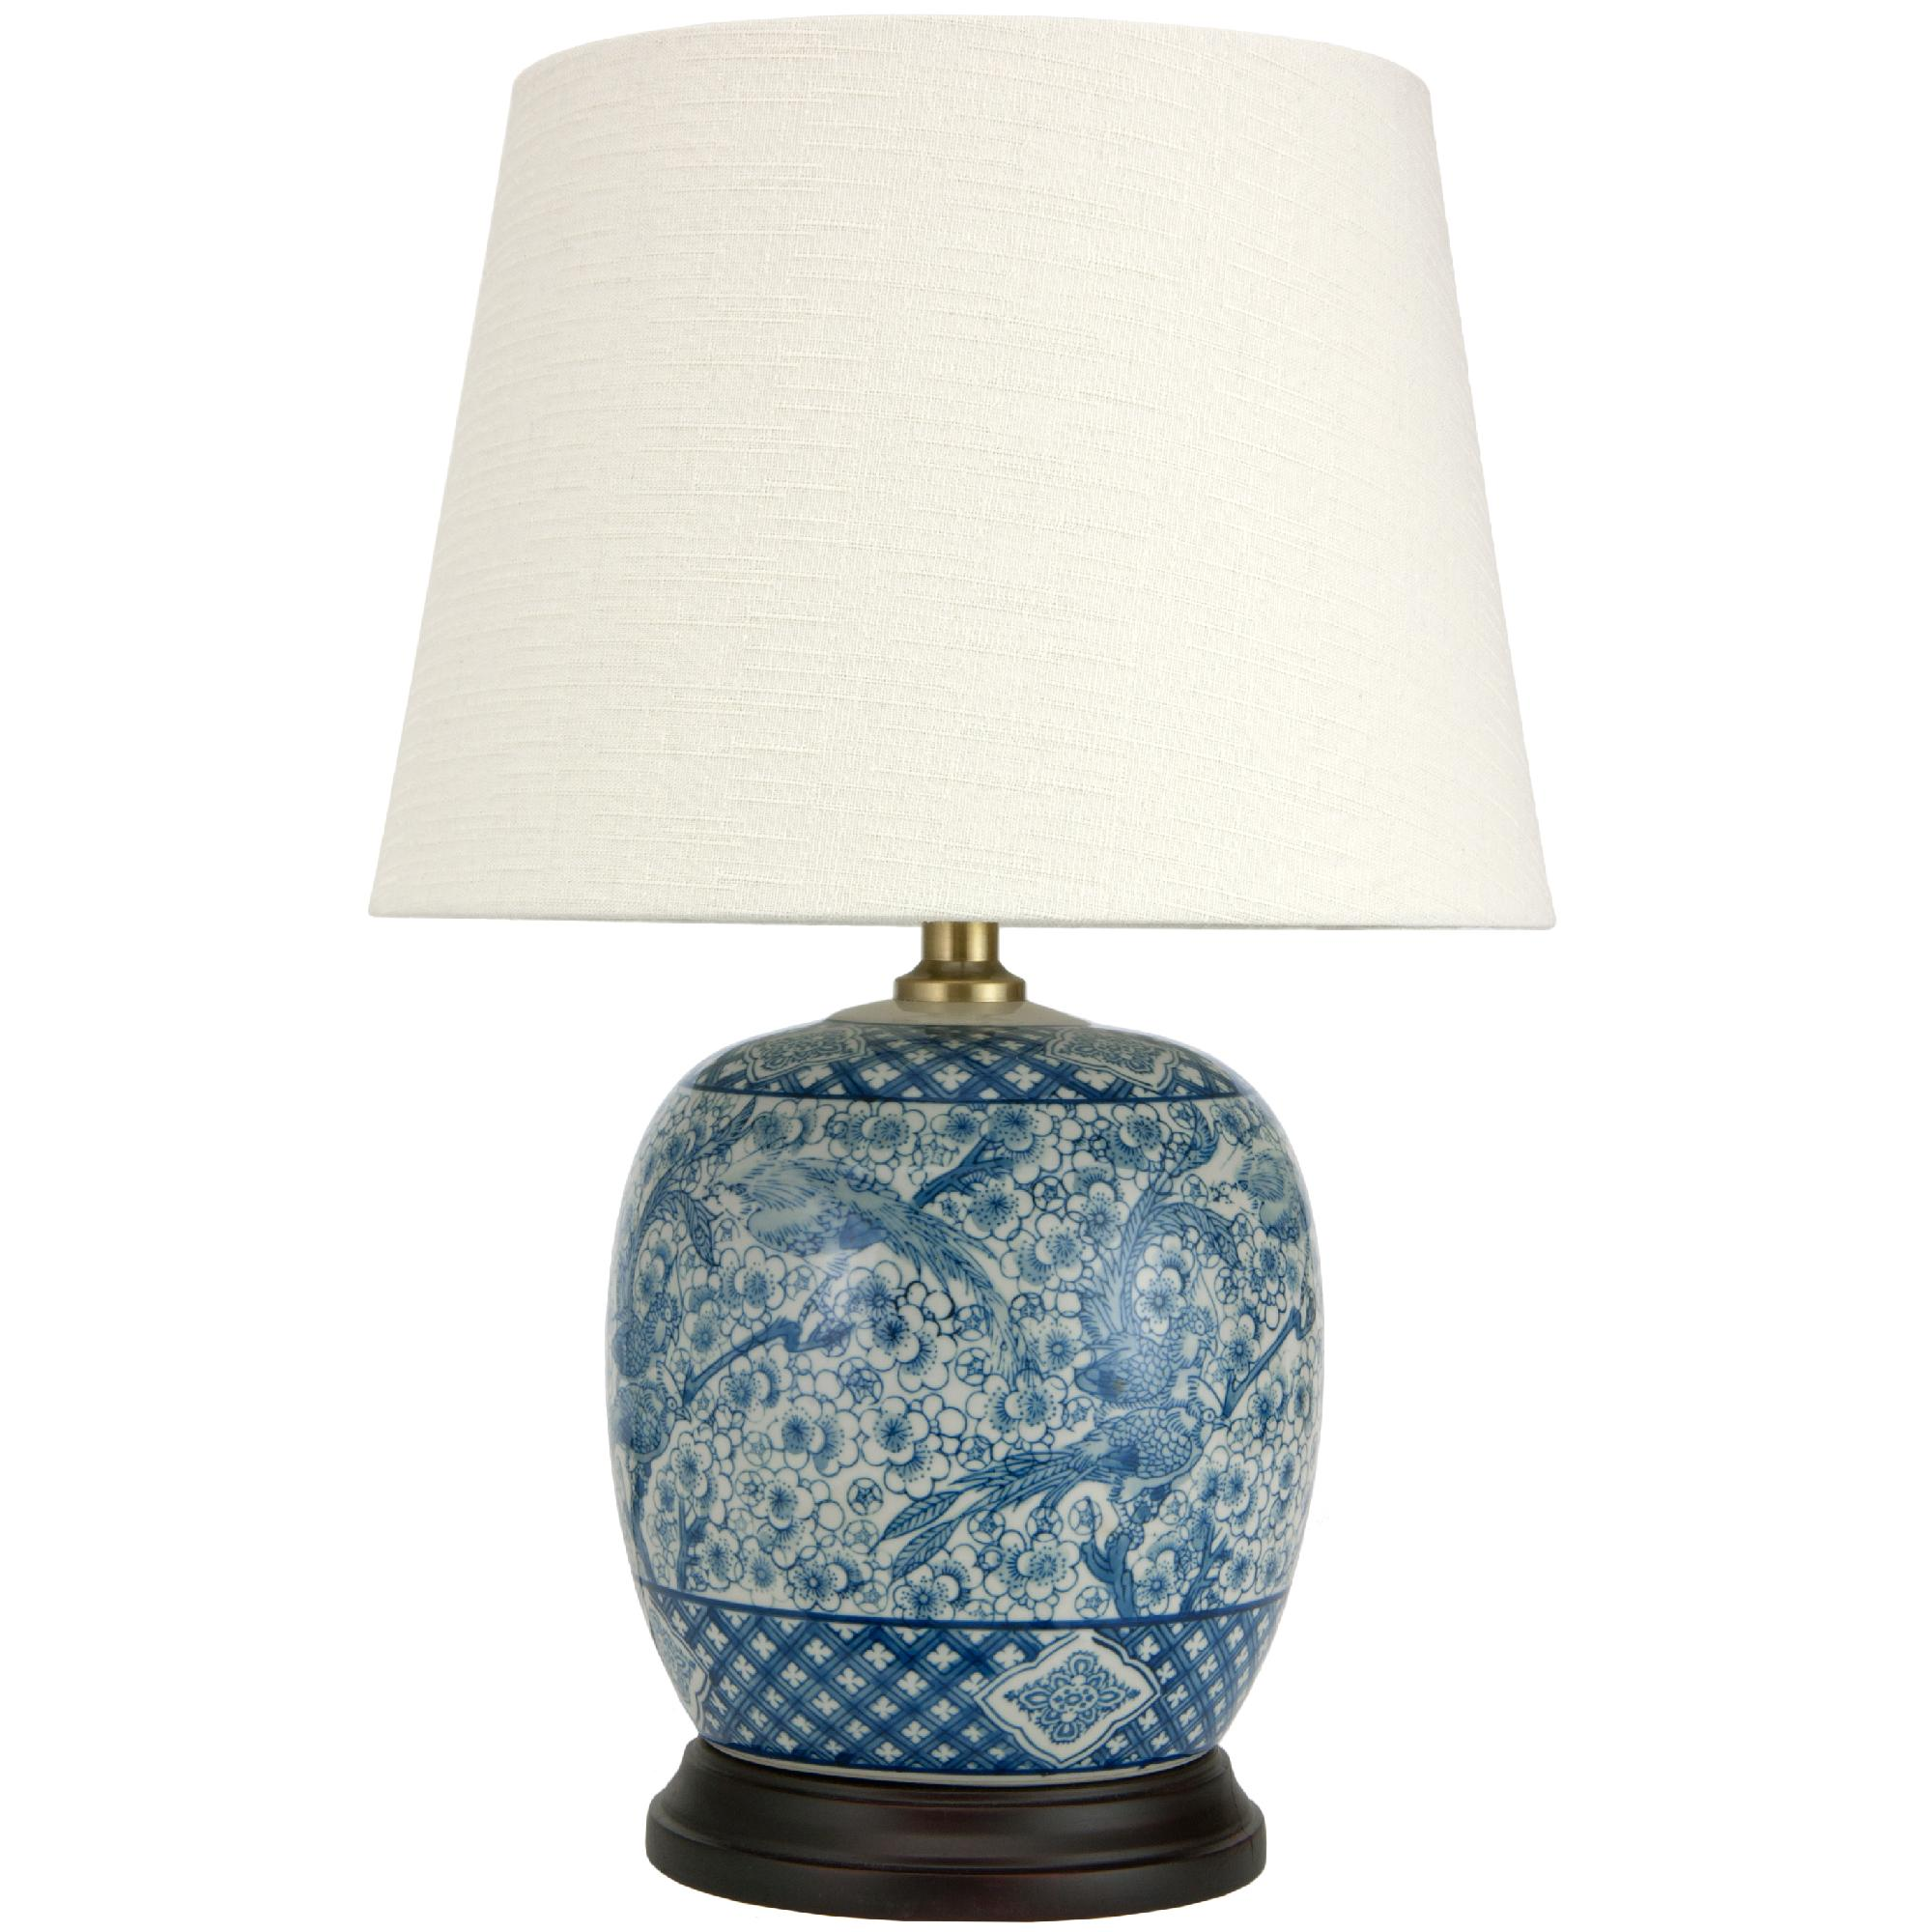 Oriental Furniture Blue & White Porcelain Round Vase Lamp